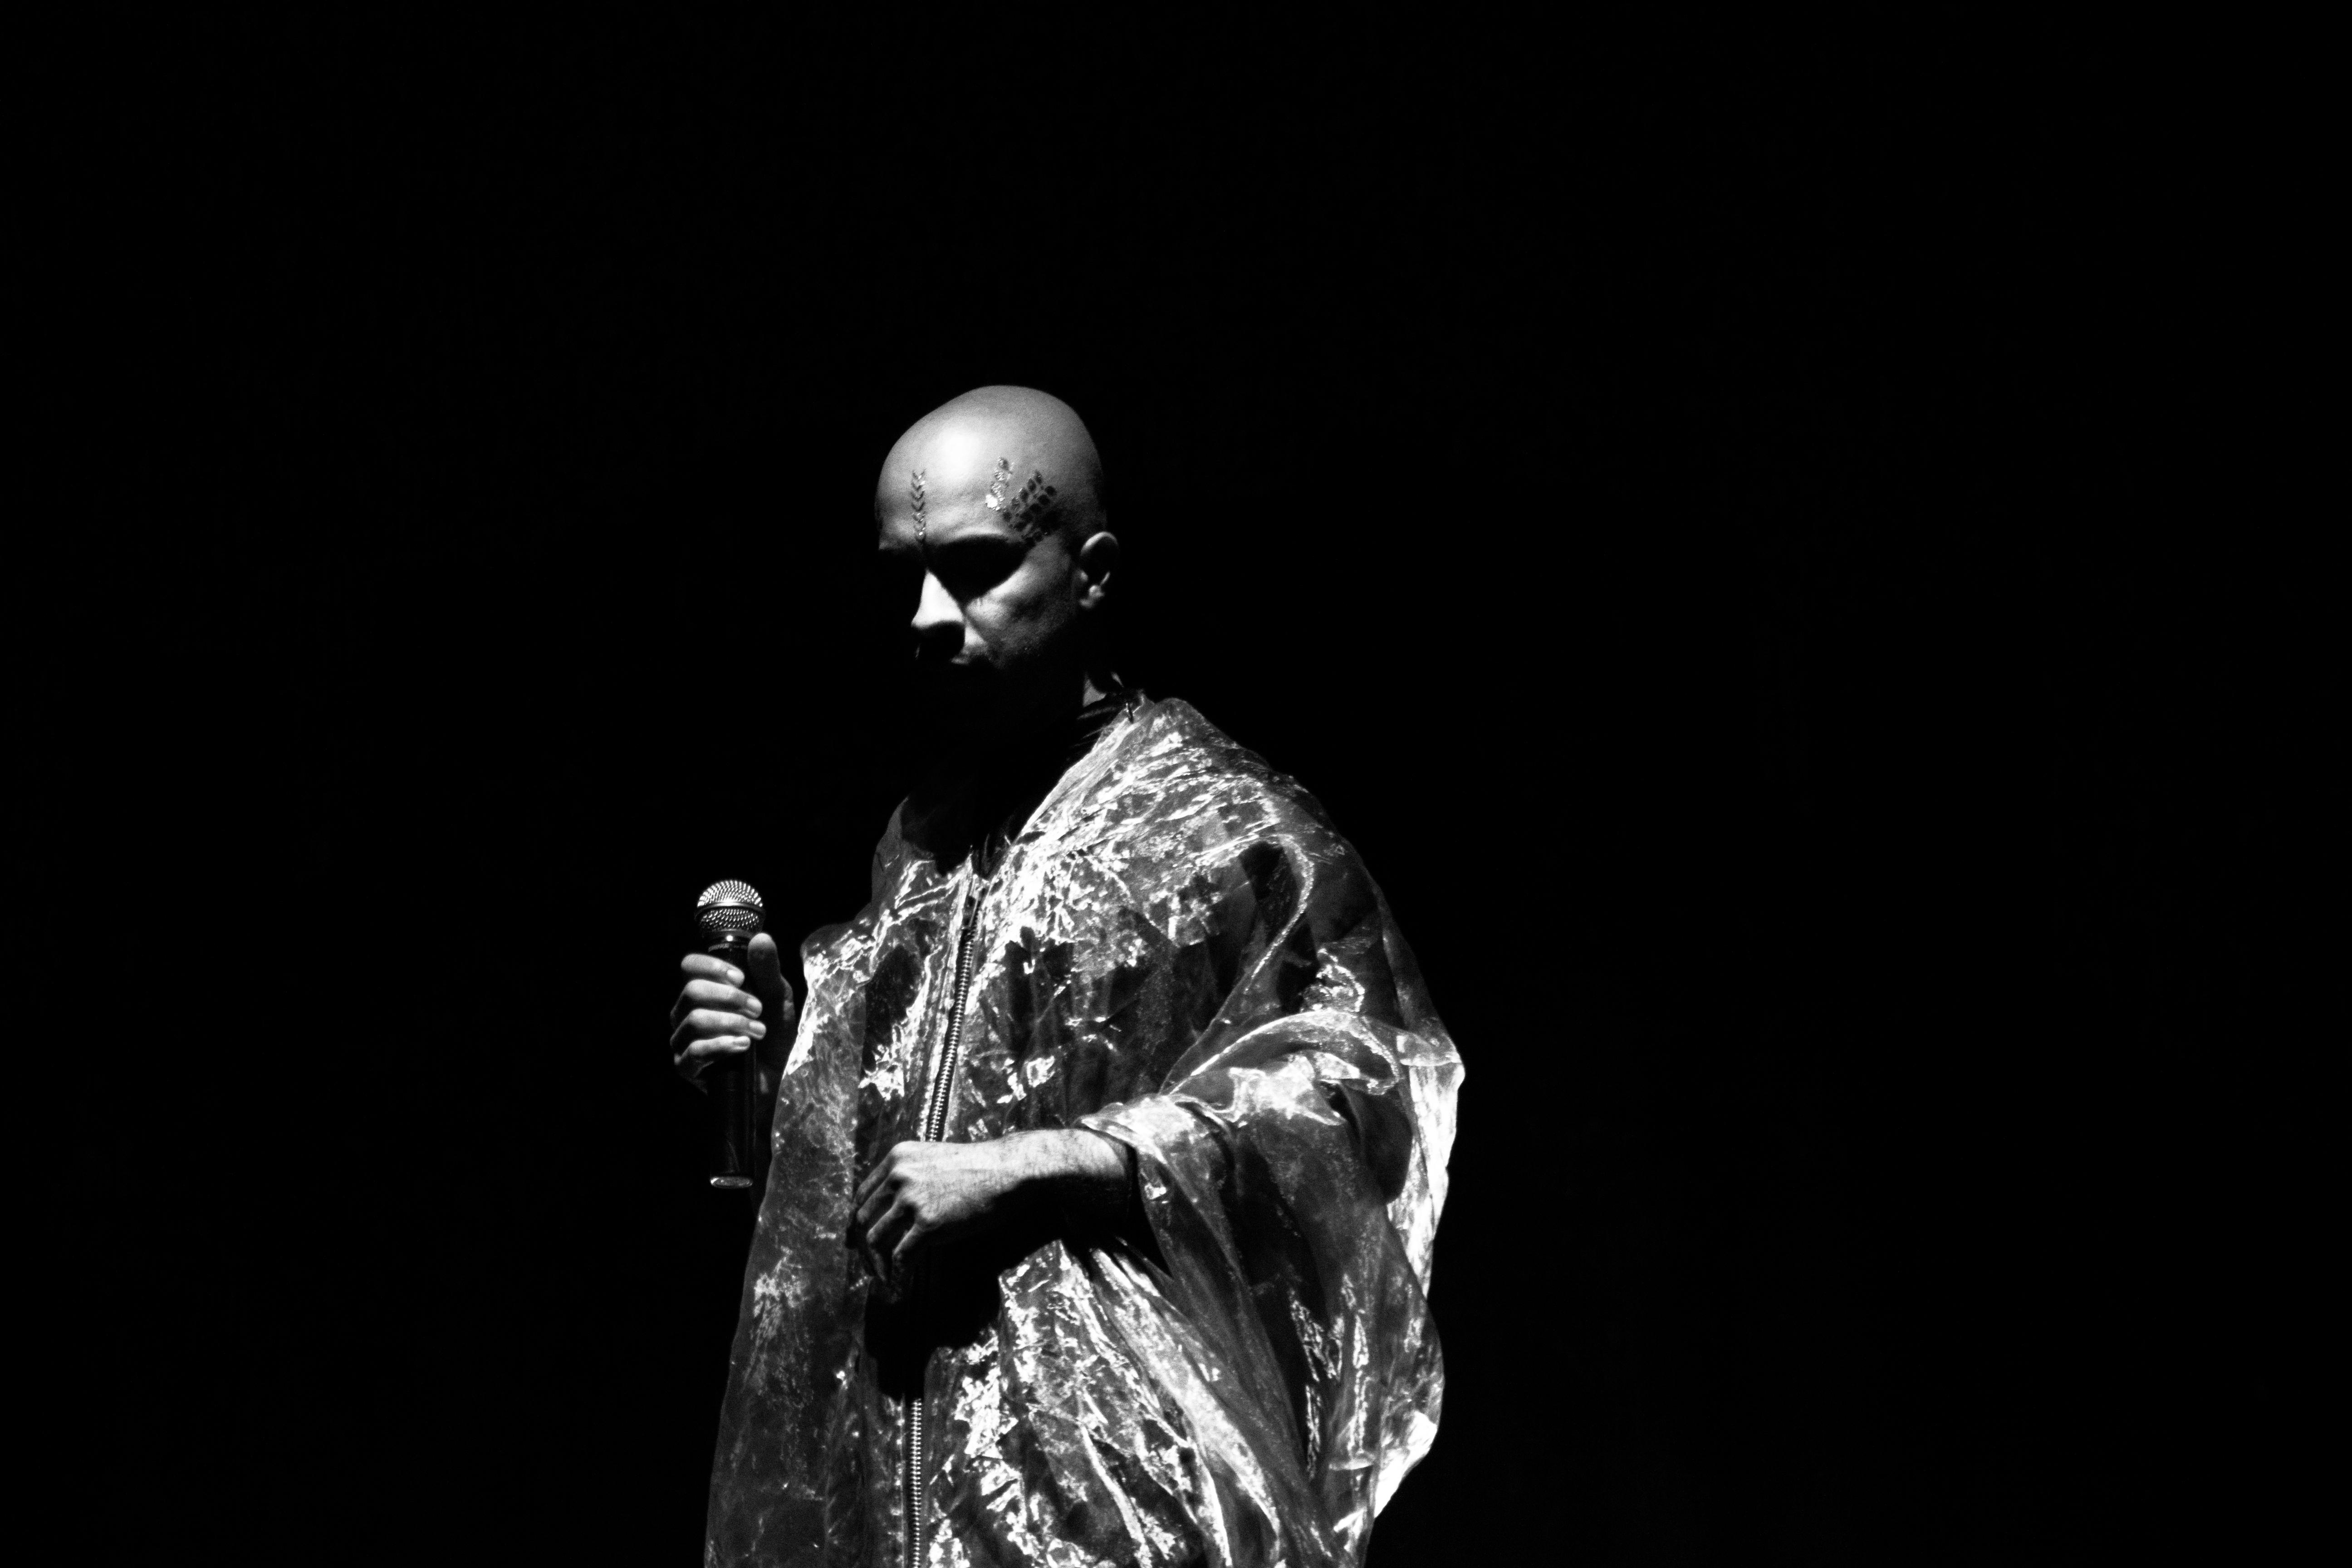 Bruno Capinan / Itaú Cultural (2017)